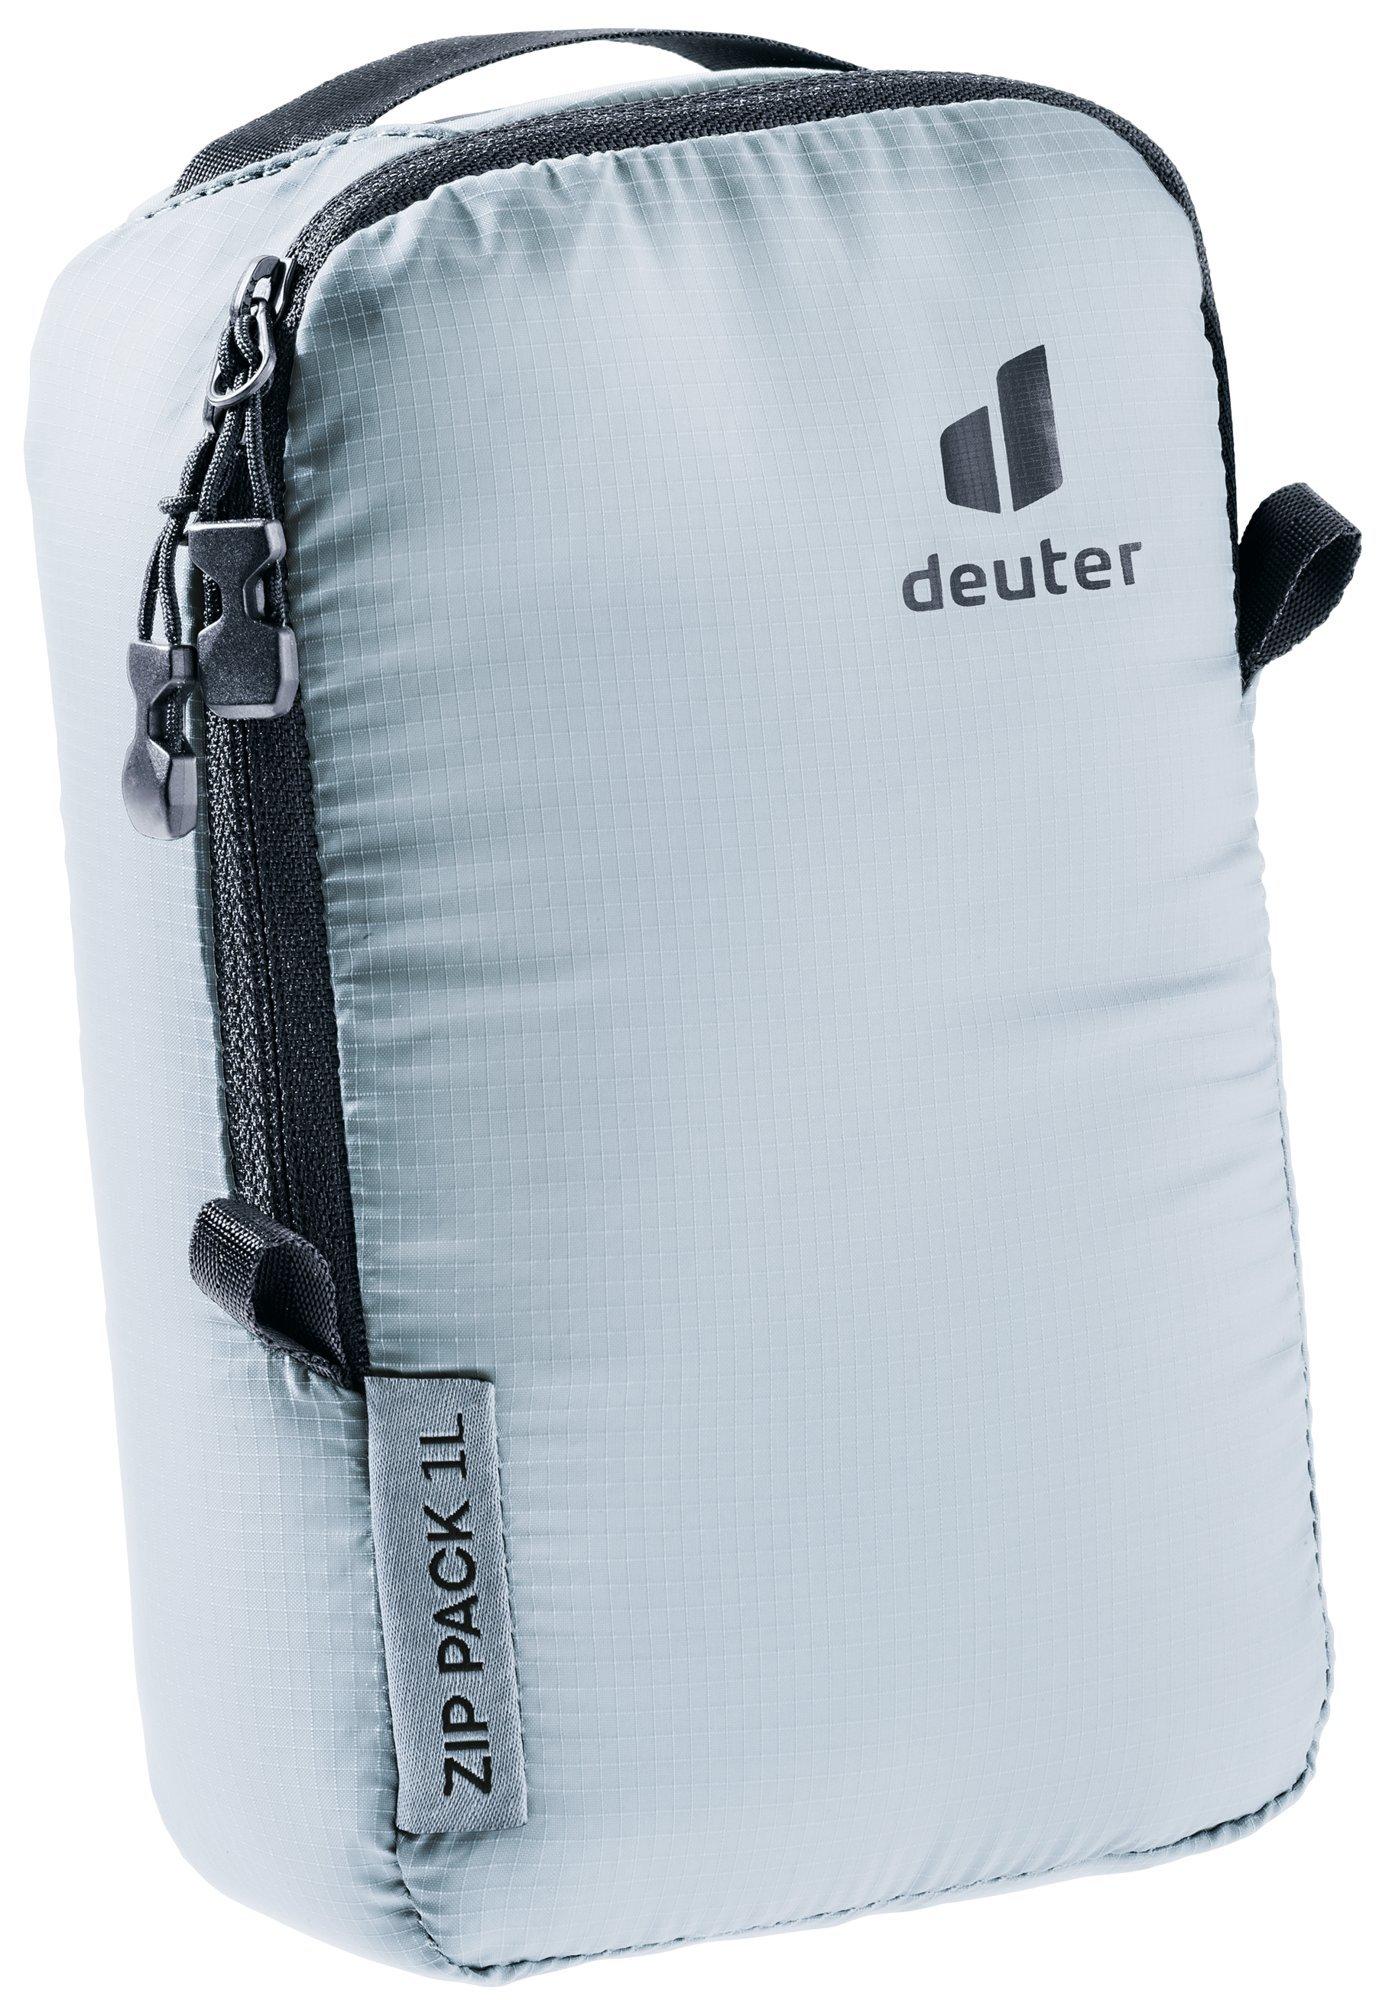 Новинки Упаковочный мешок Deuter Zip Pack 1 (2021) 3941421-4012-ZipPack1-w20-d0.jpg